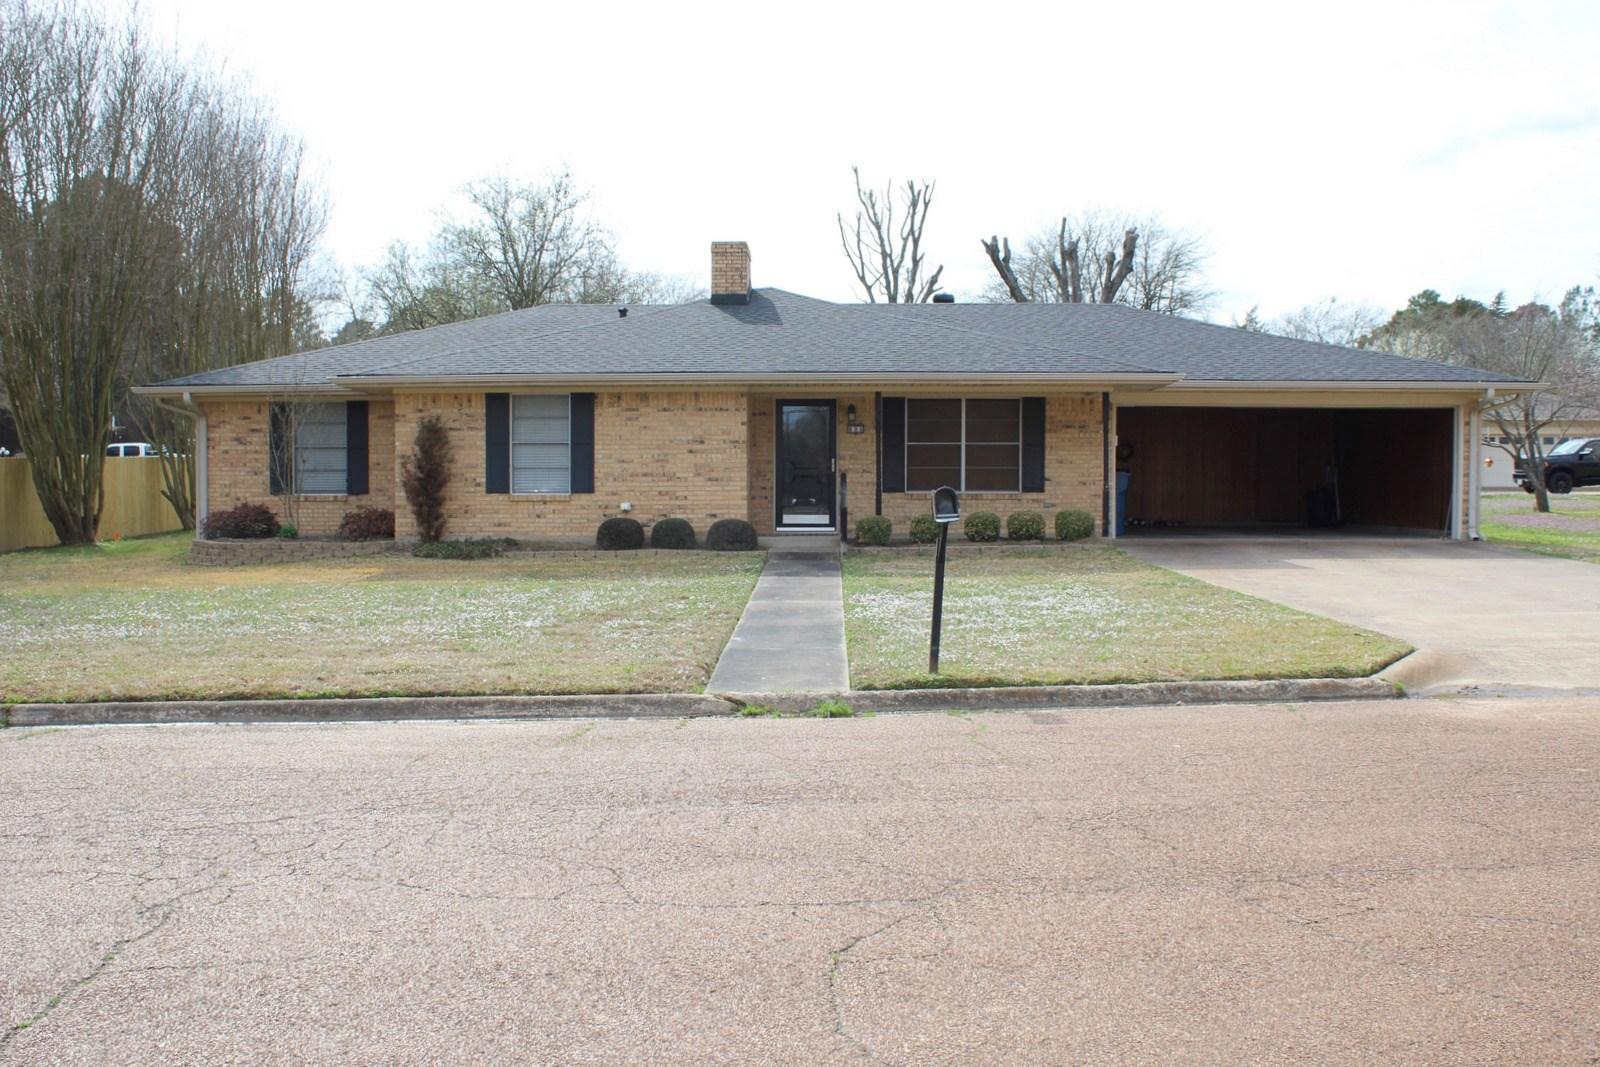 3/2/2 BRICK HOME WINNSBORO, TEXAS WOOD COUNTY WISD EAST TX